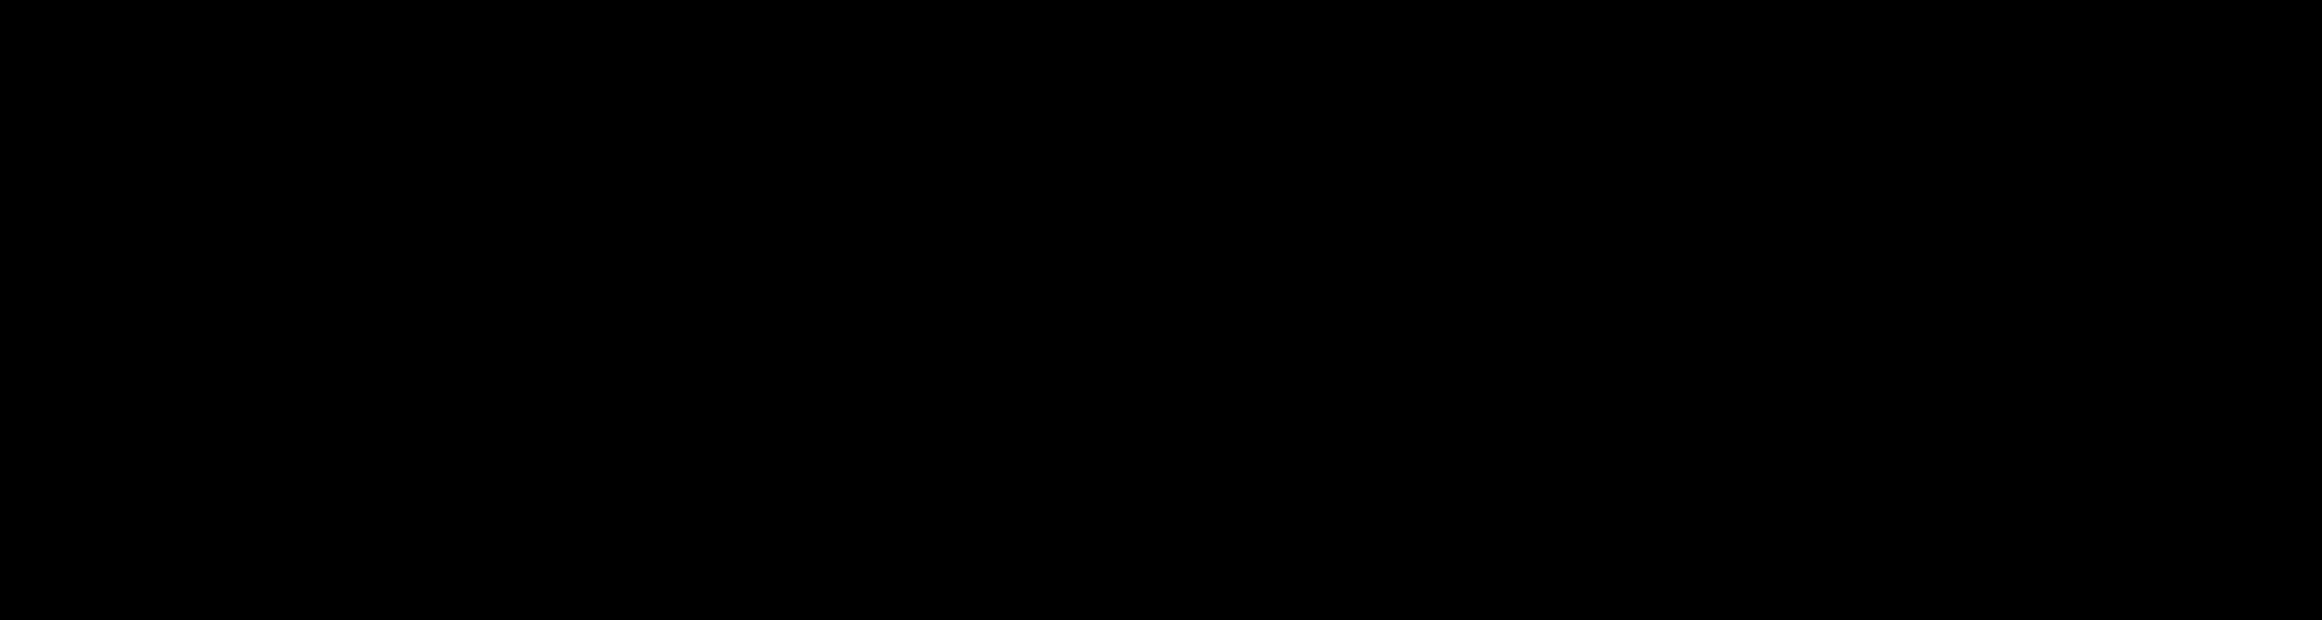 tert-Butyl 6-(4-((2-amino-9H-purin-6-yloxy)methyl)benzylamino)-6-oxohexylcarbamate